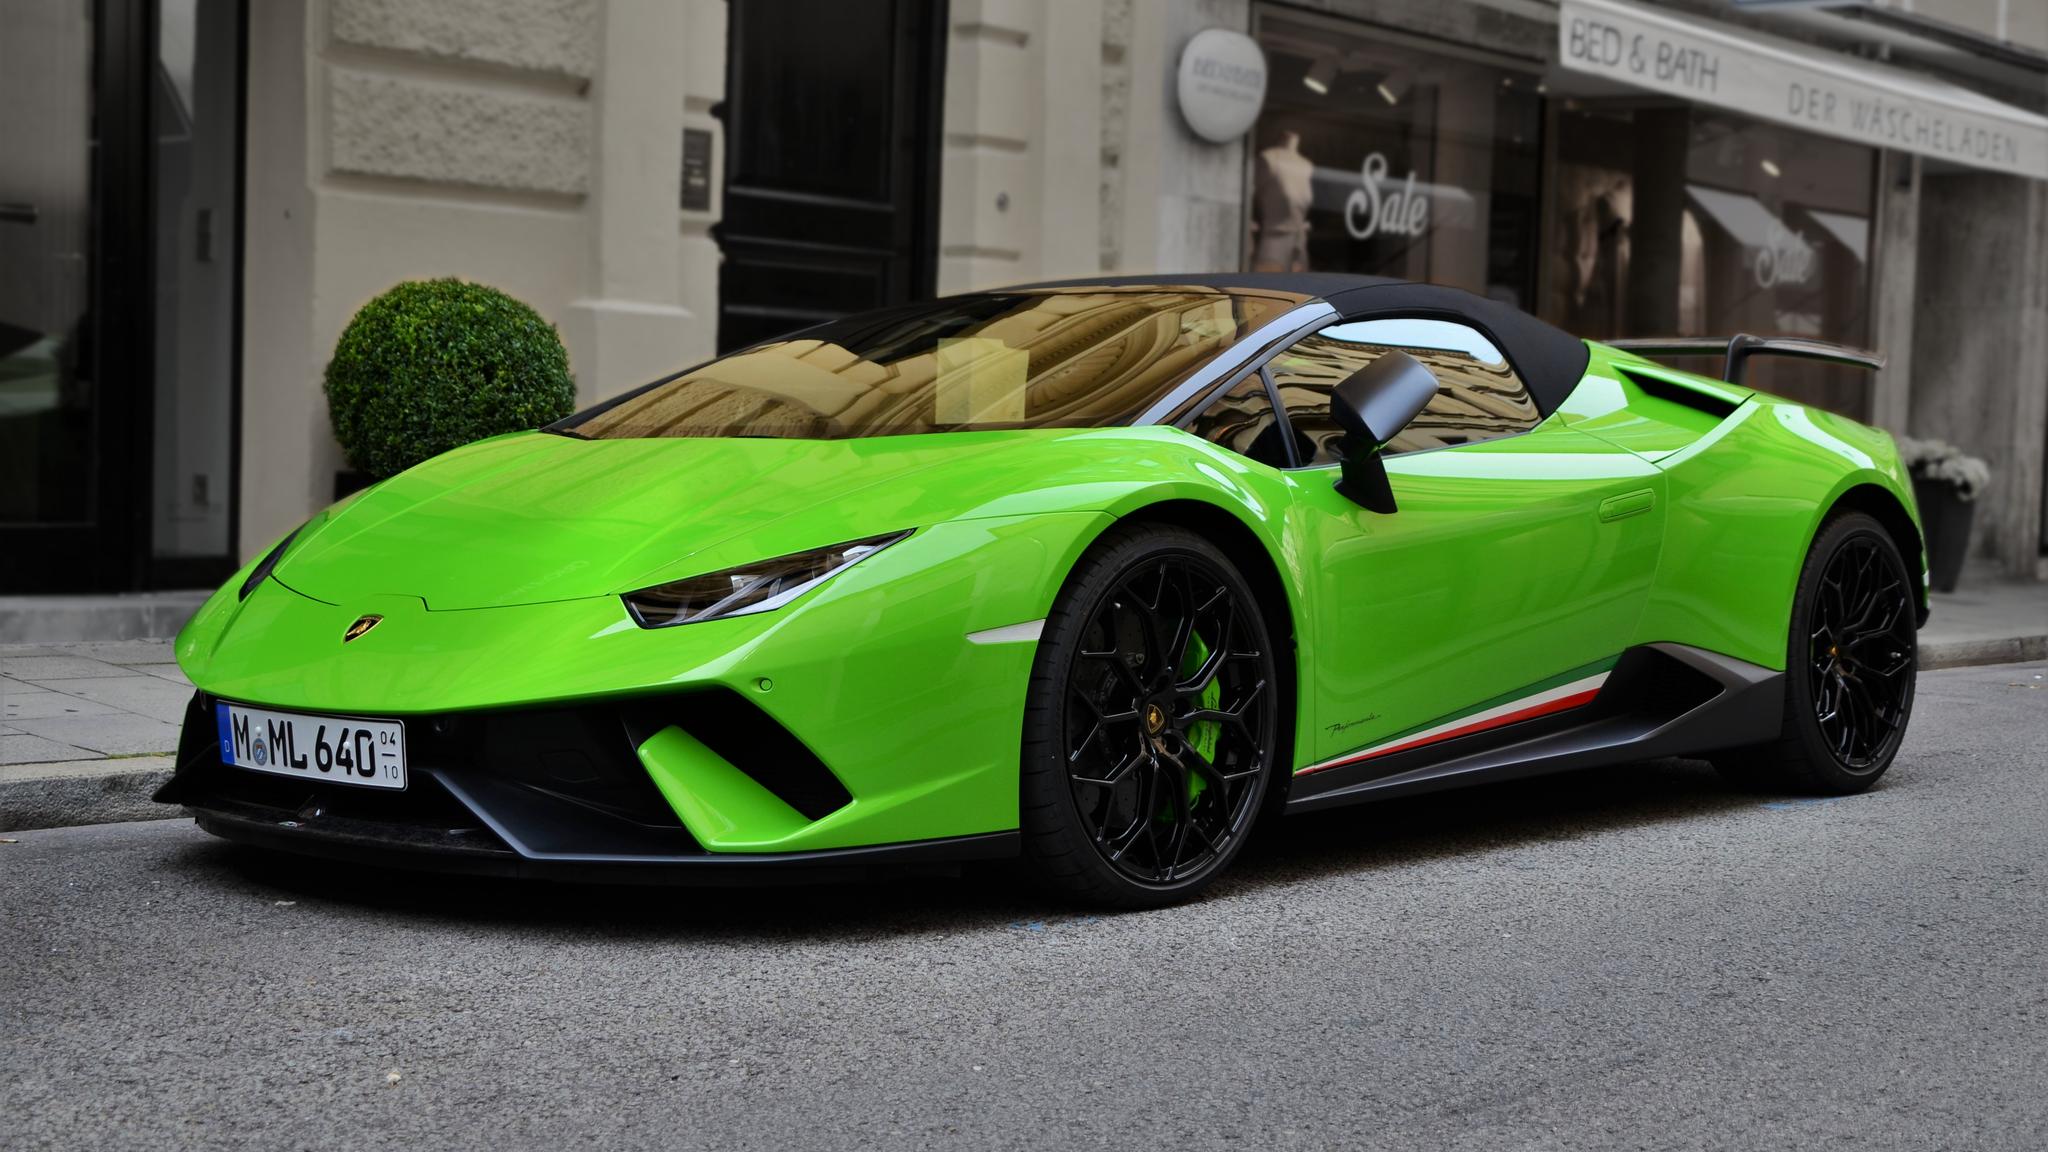 Lamborghini Huracan Performante Spyder - M-ML-640